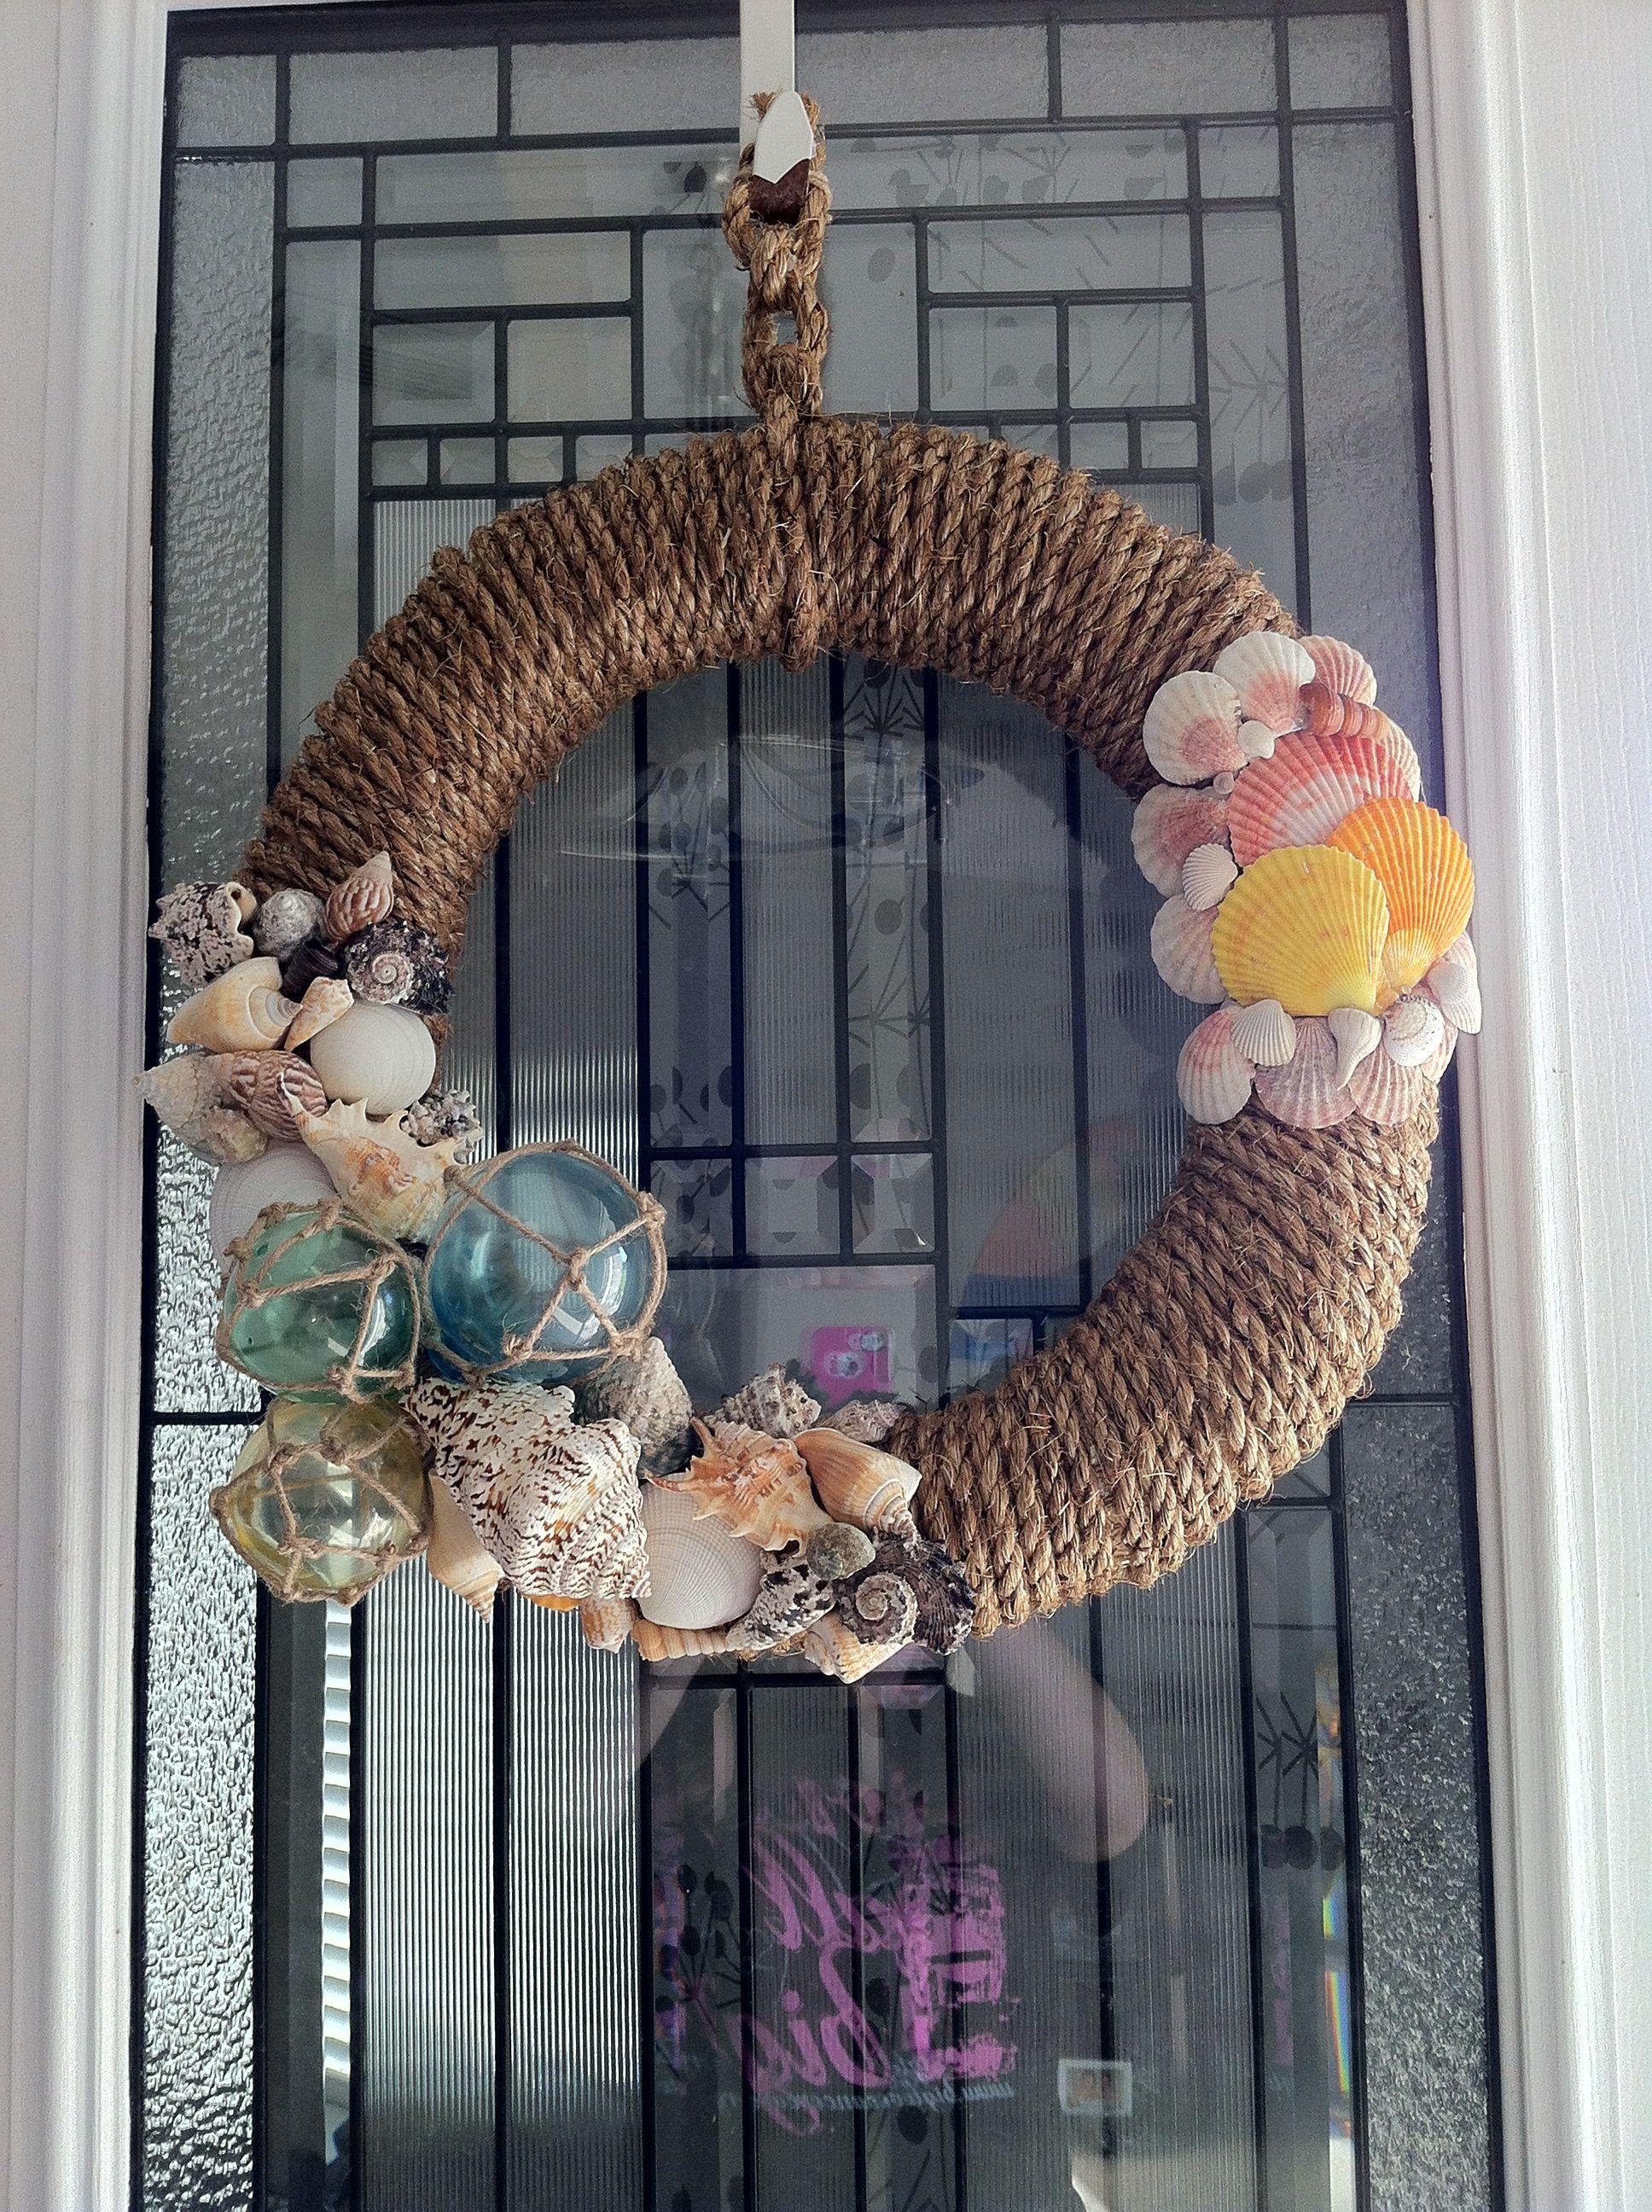 Seashell wreath craft show summer ideas pinterest for Seashell wreath craft ideas